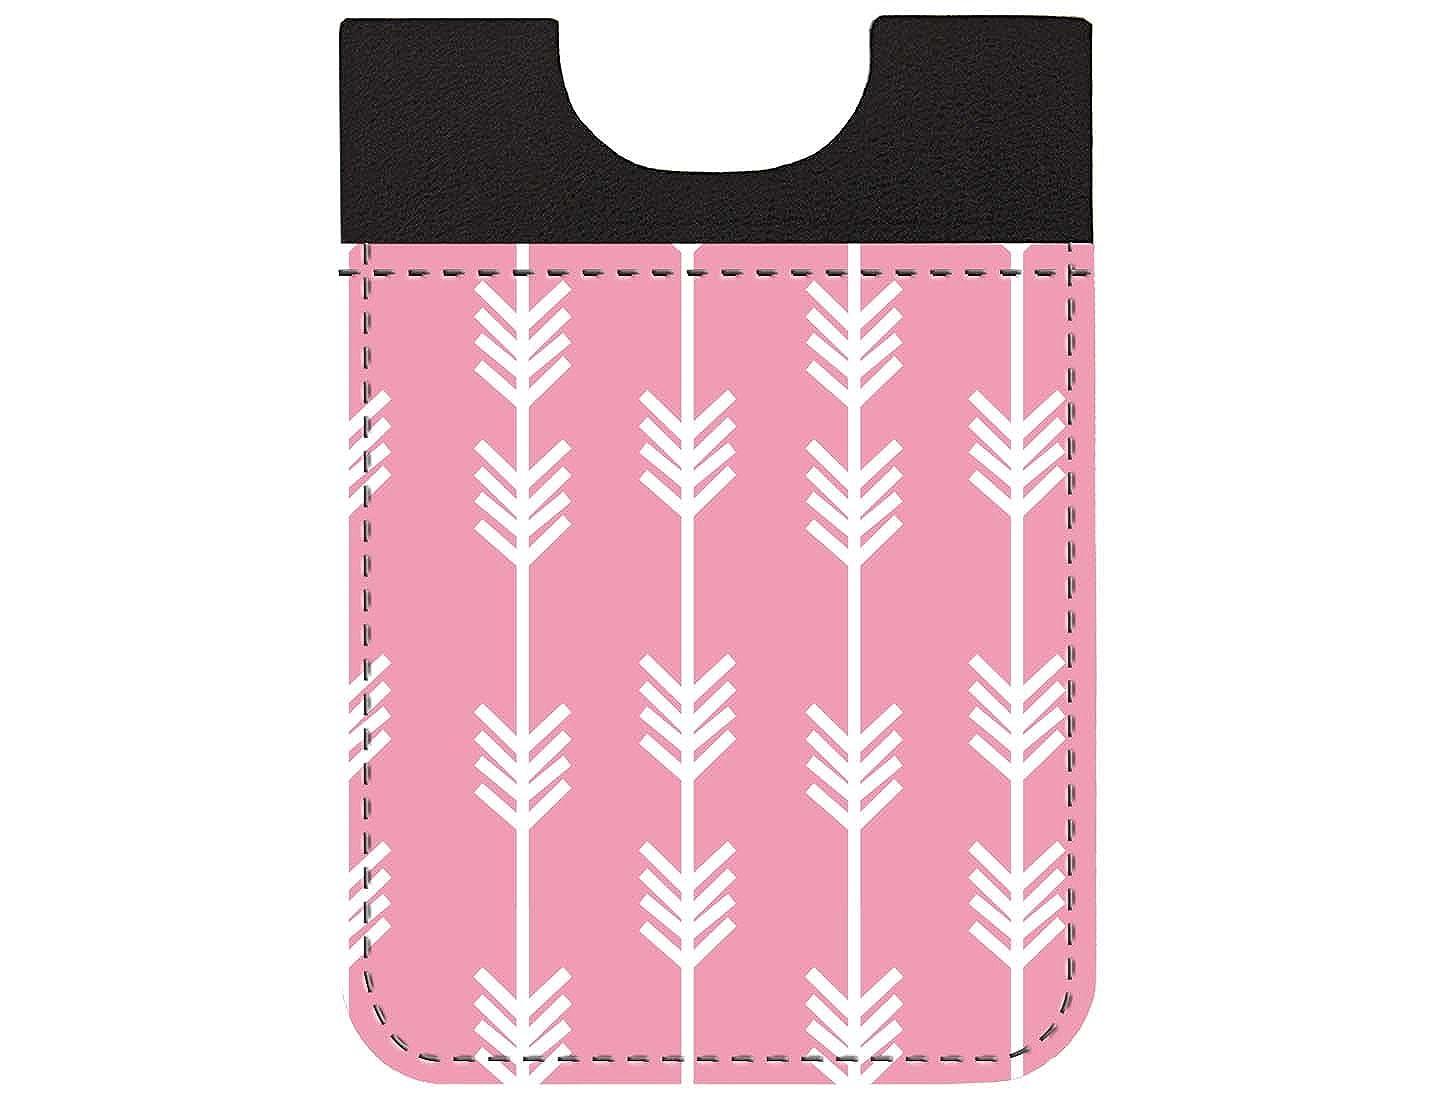 Trendy Boho Pink Arrow Design Genuine Leather Card Caddy Credit Card Phone Wallet